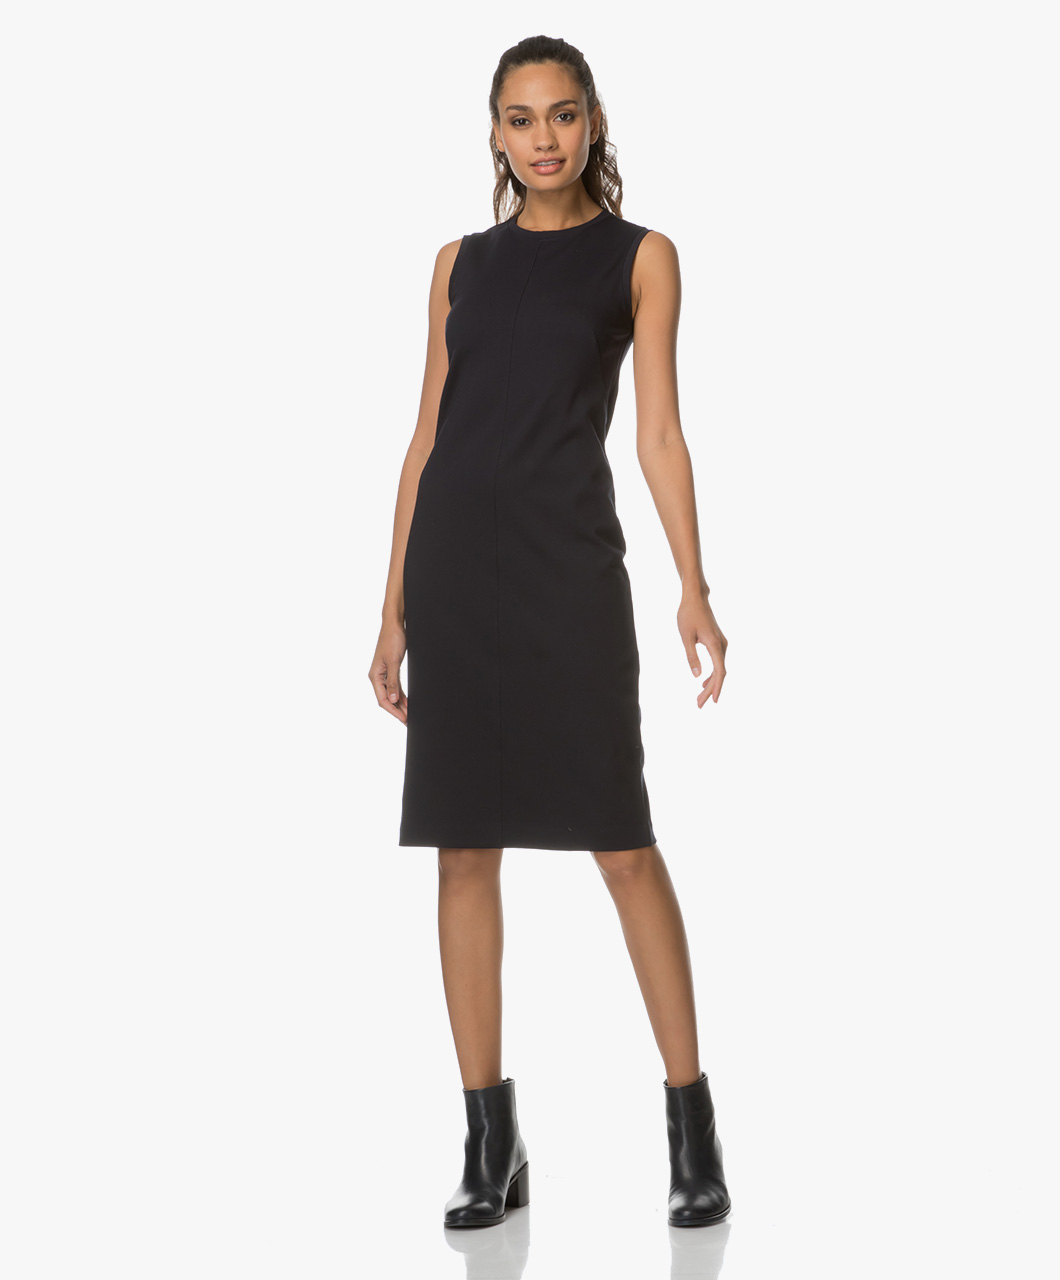 filippa k fitted shift dress